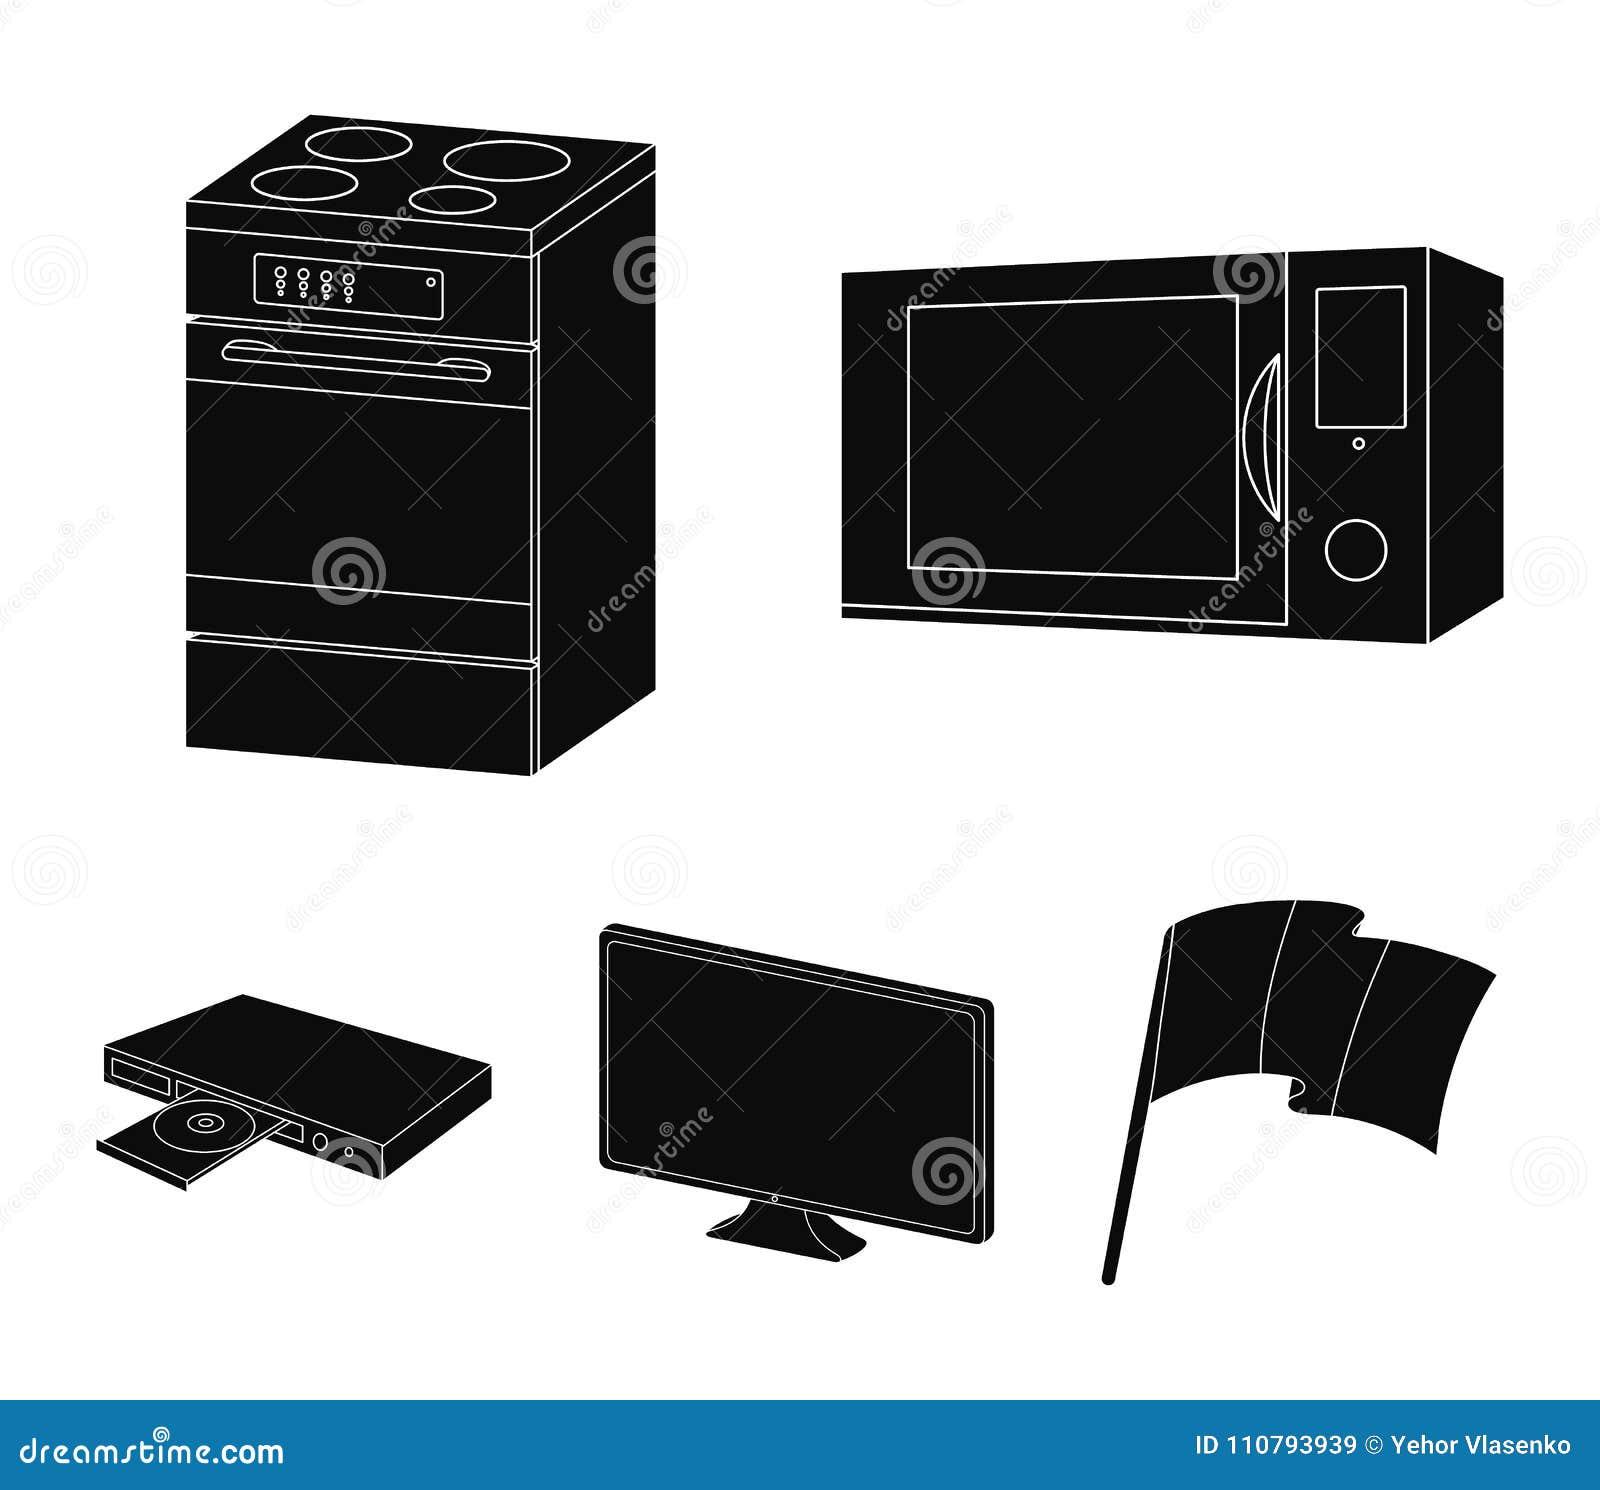 Aparatos Electrodomesticos E Iconos Negros Del Equipo En La - Electrodomesticos-negros